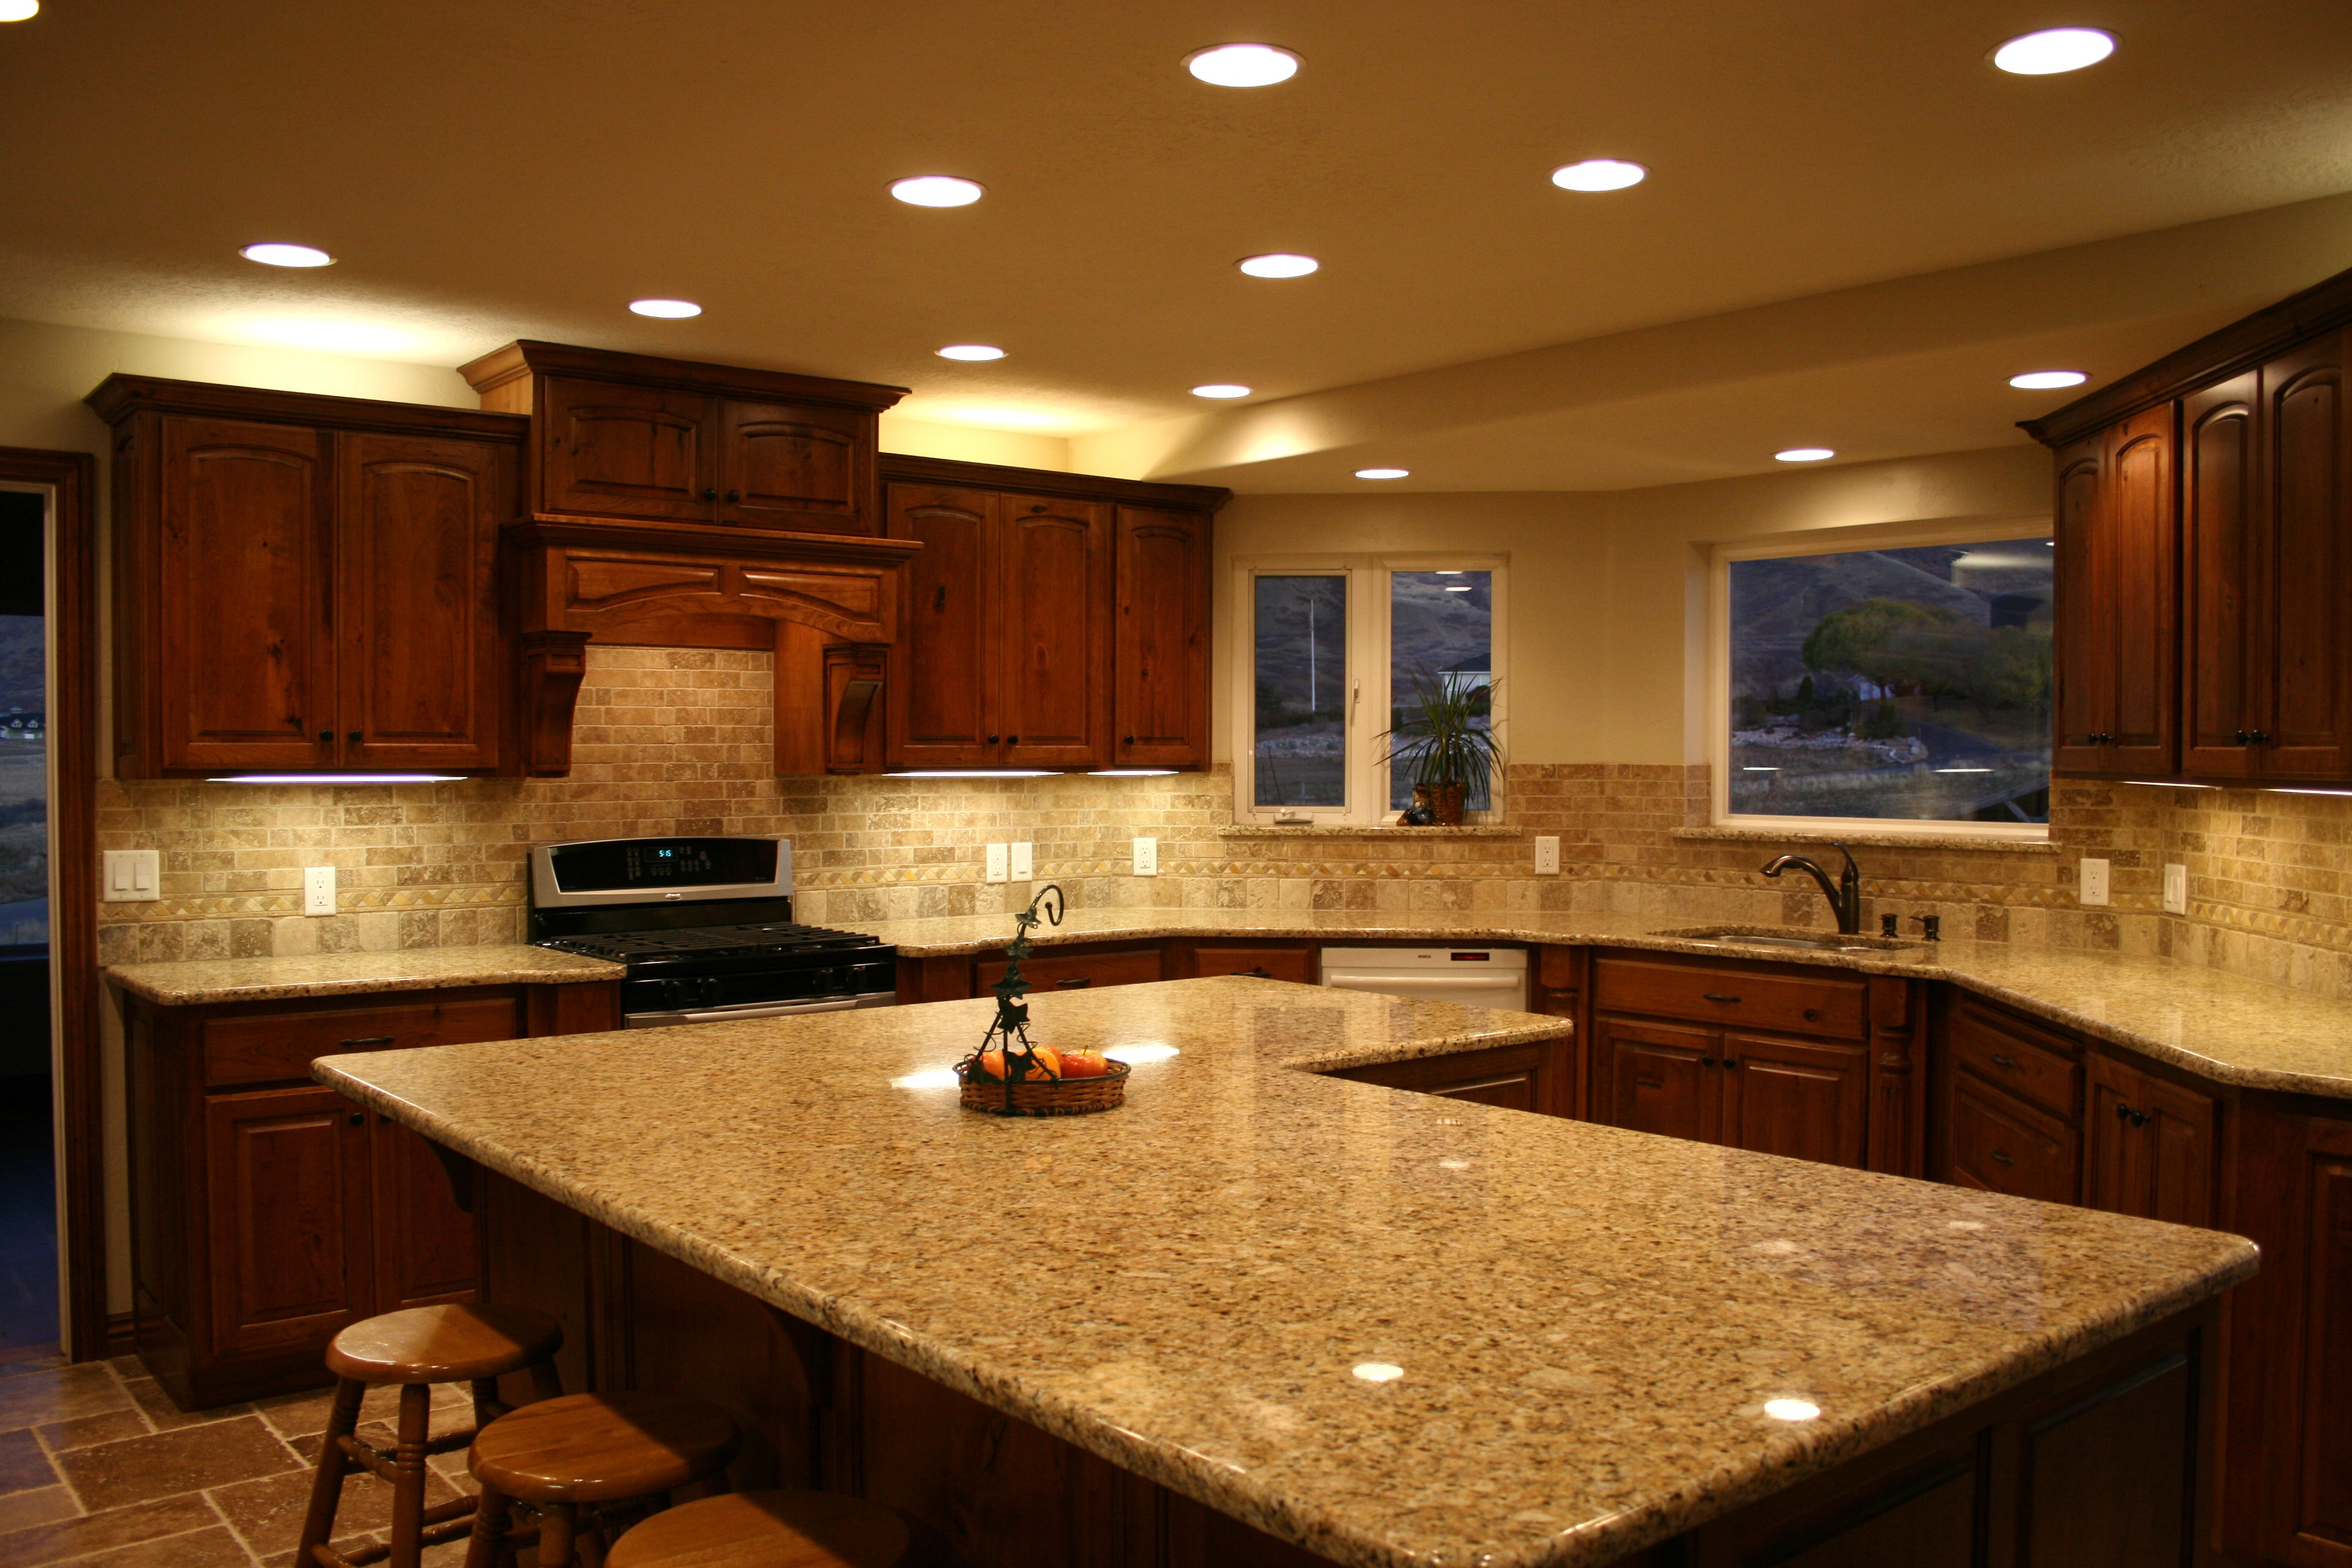 granite kitchen design ideas photo - 10